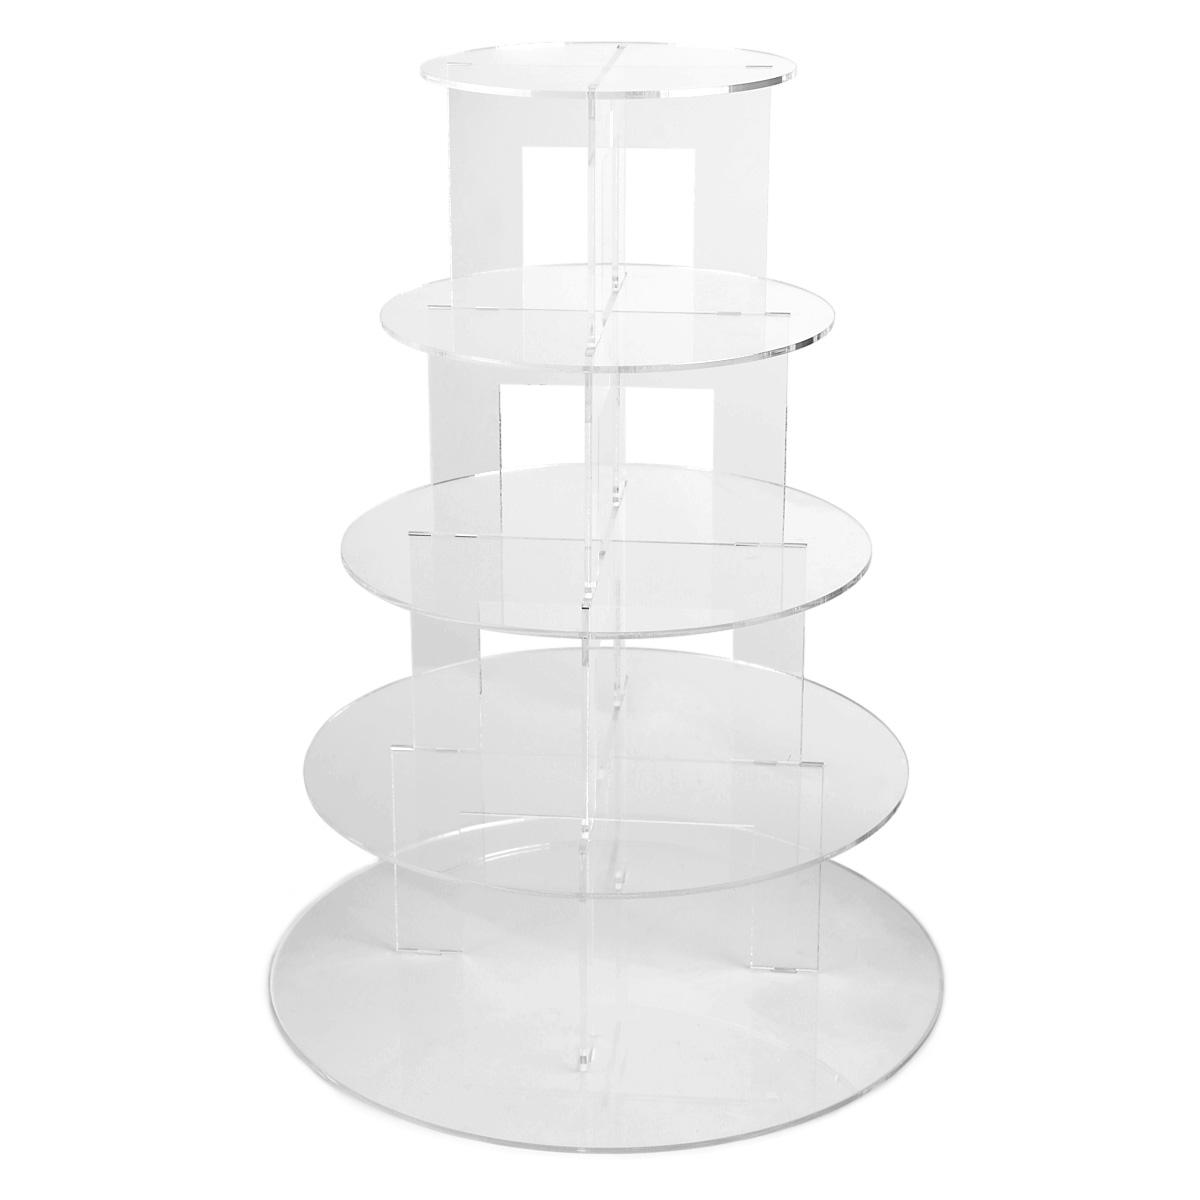 5 etages pr sentoir g teau acrylique support stand mariage. Black Bedroom Furniture Sets. Home Design Ideas